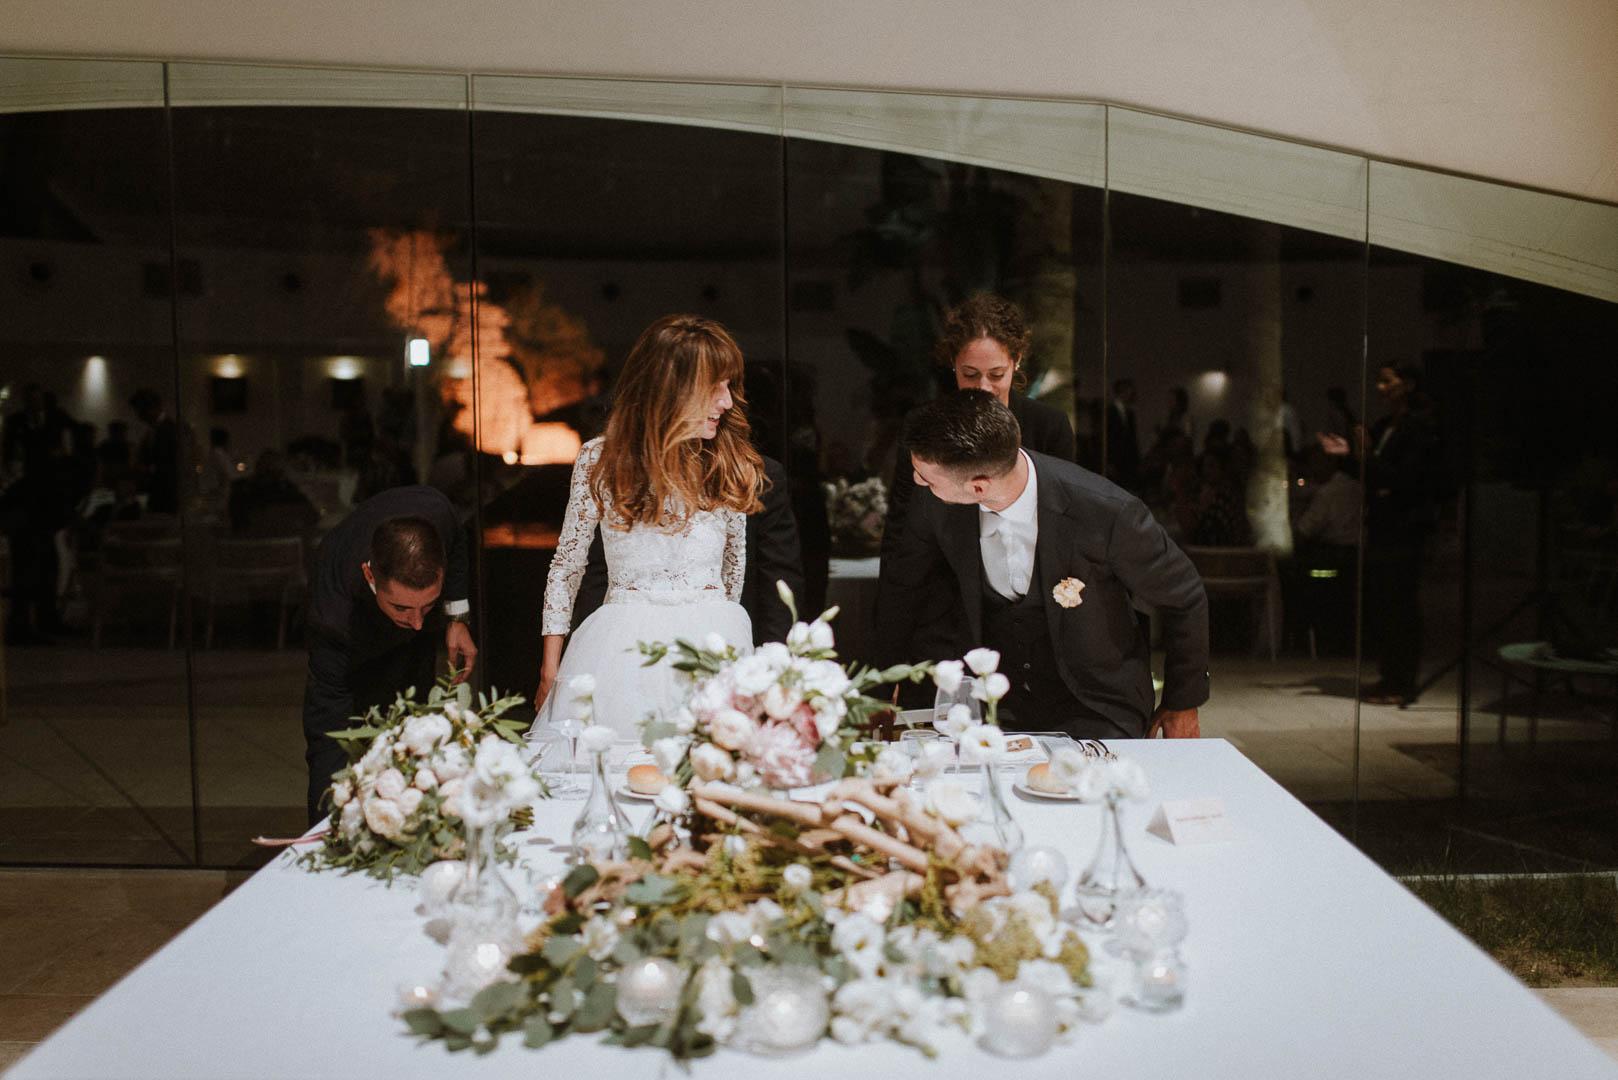 wedding-photographer-destination-fineart-bespoke-reportage-napoli-nabilah-vivianeizzo-spazio46-174